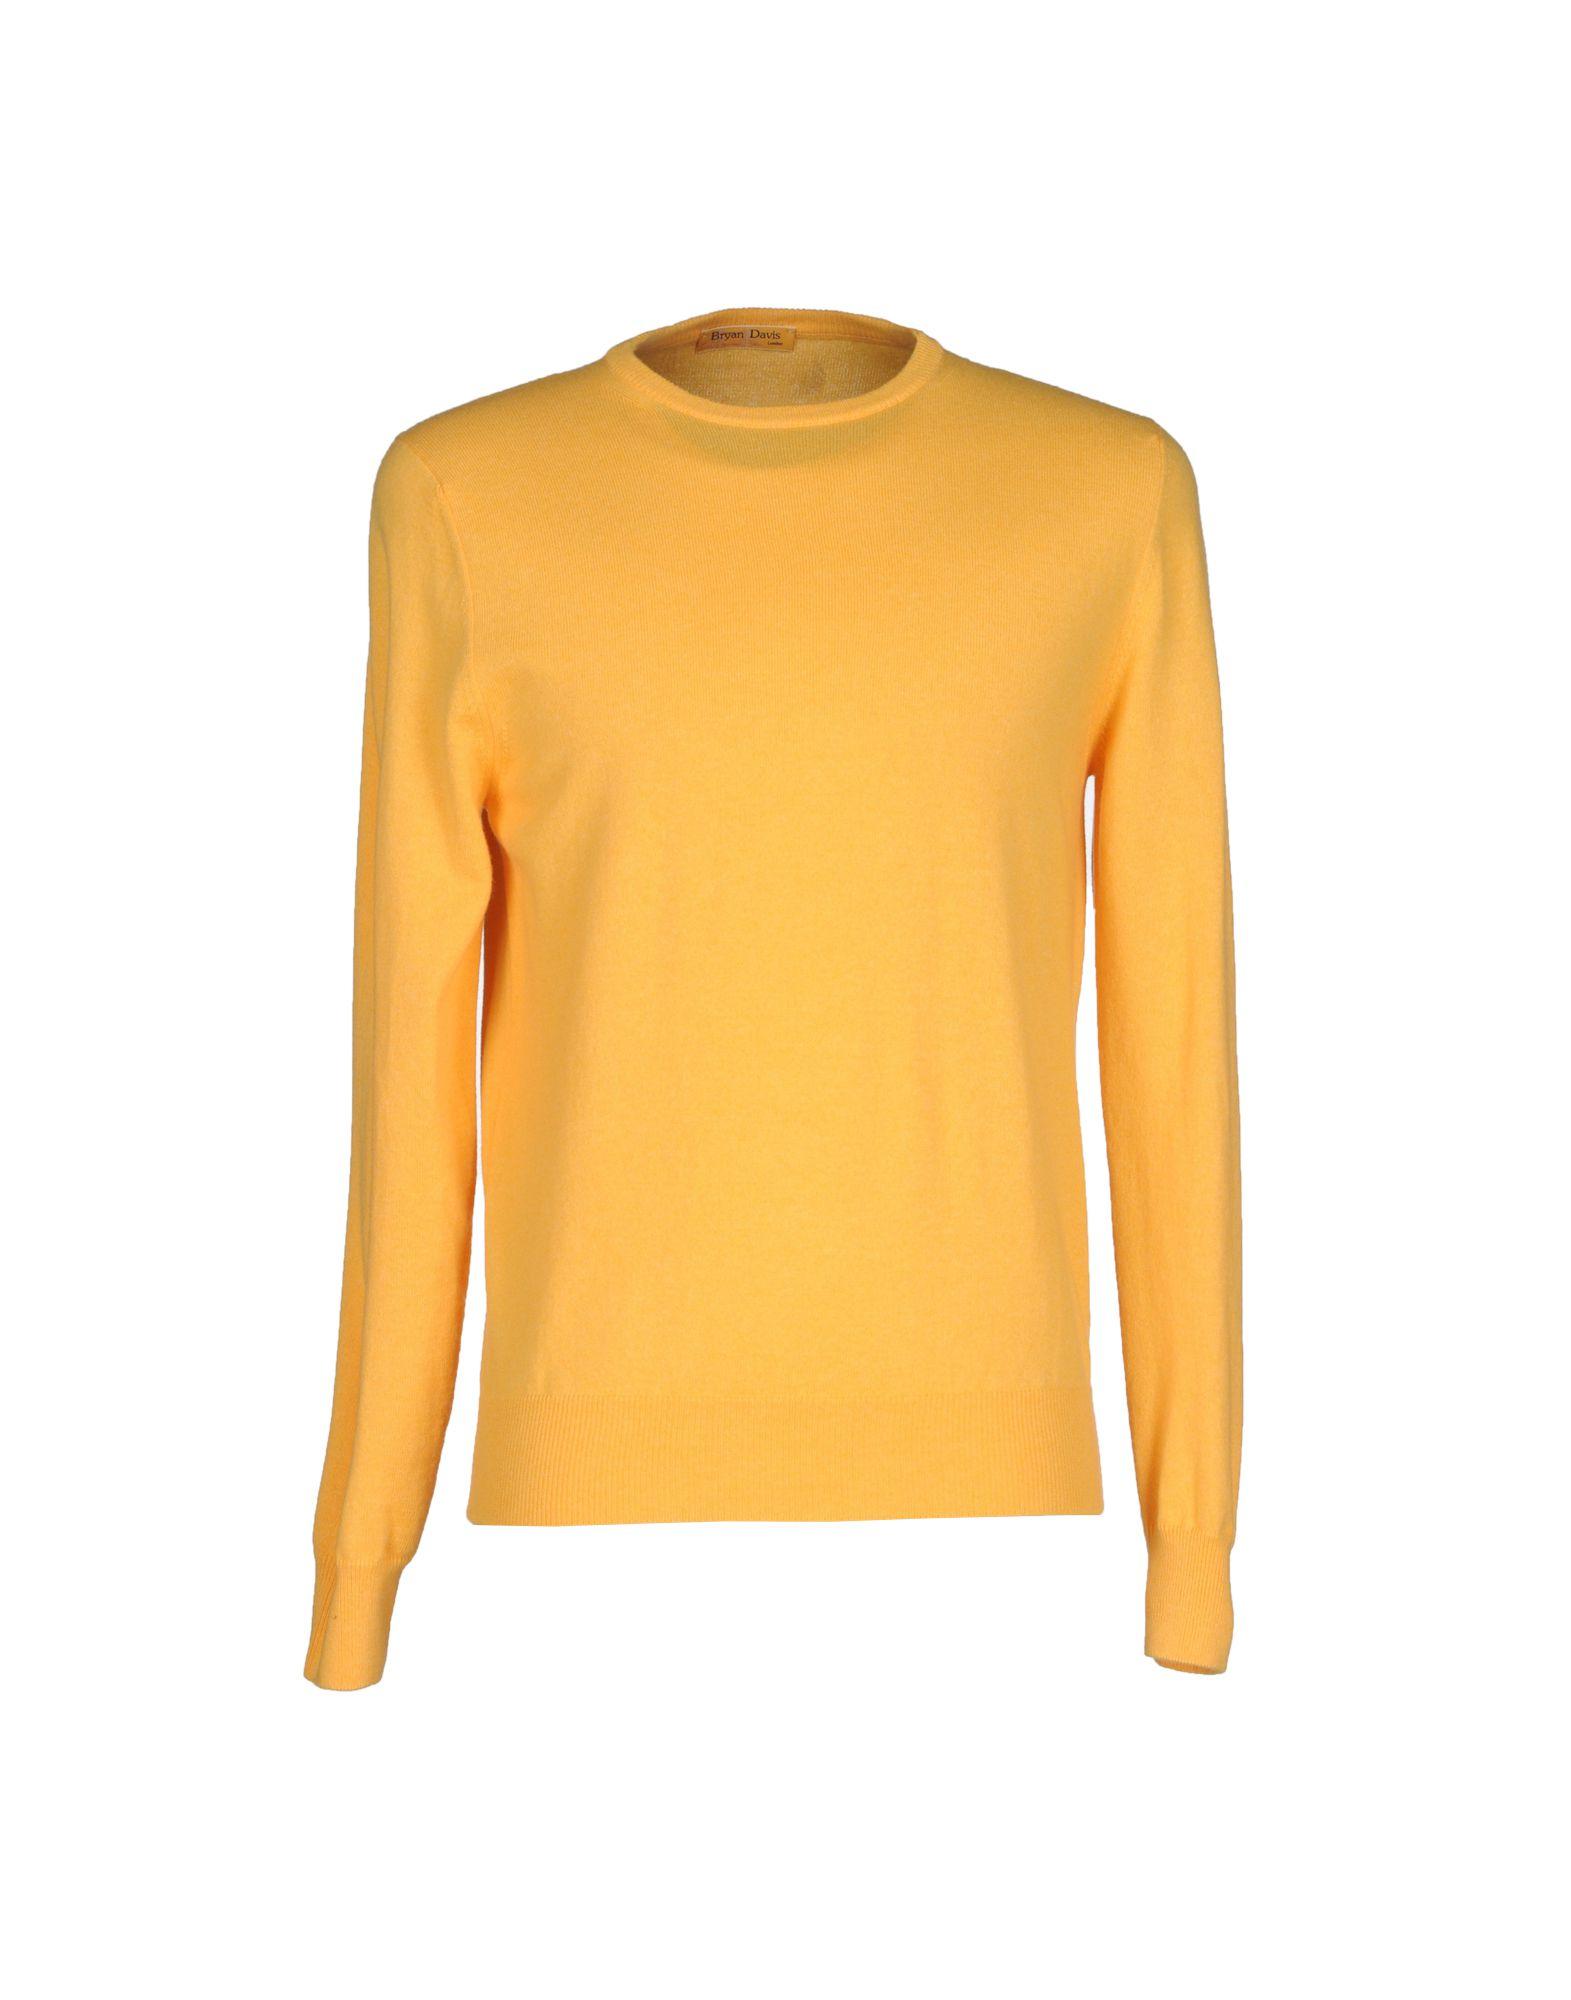 BRYAN DAVIS Sweaters